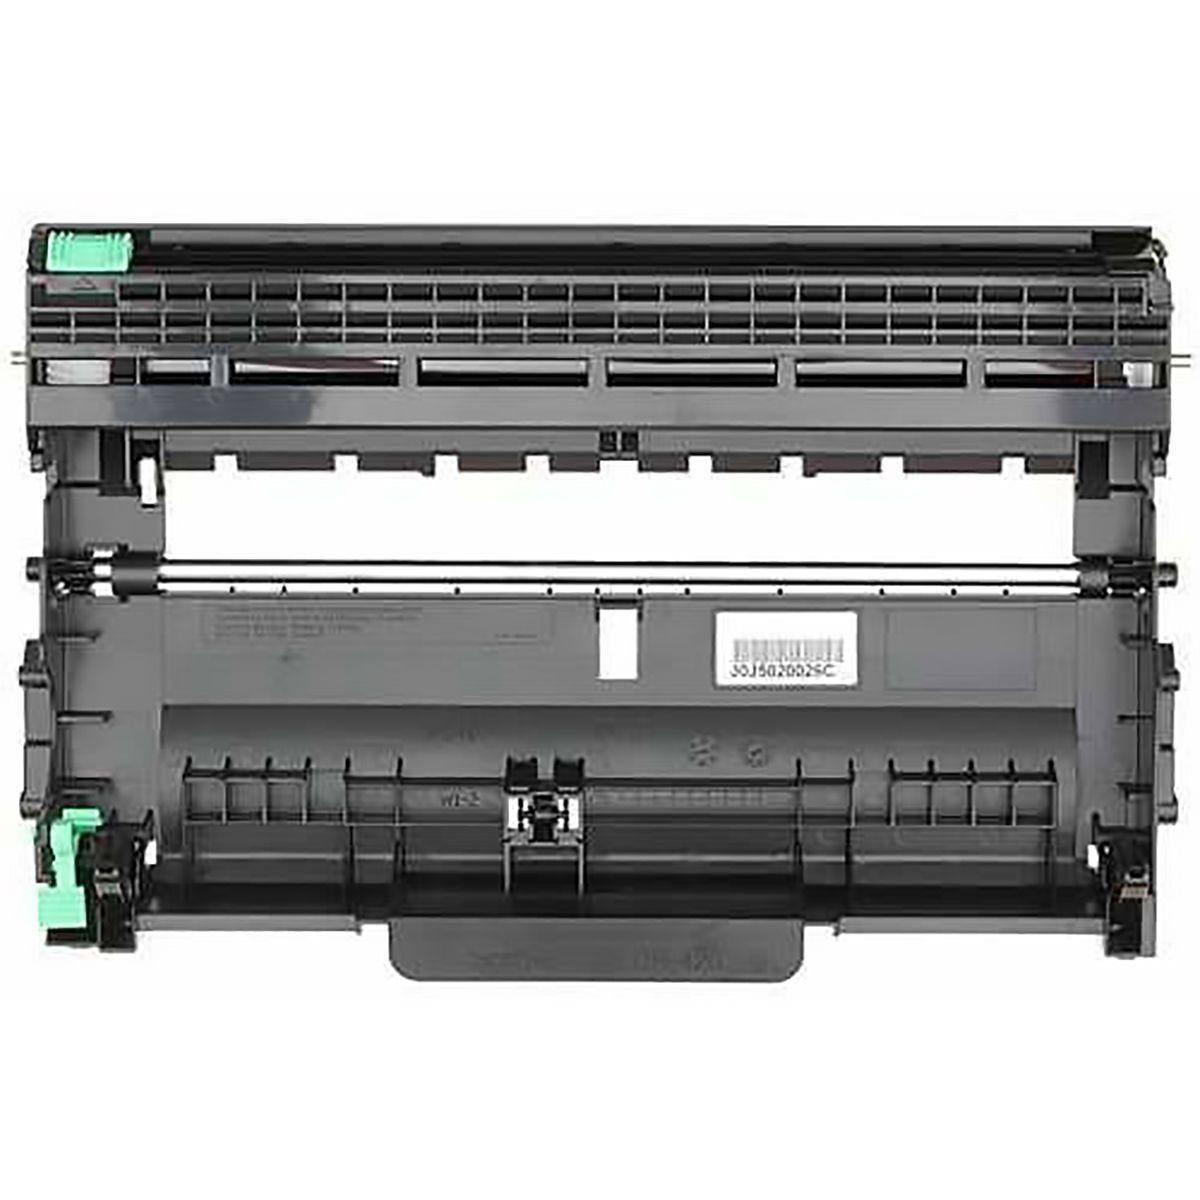 Compatível: Fotocondutor DR720 DR3302 para Brother DCP-8157dn 8510 8512 8112 8152 8157 8112dn 8110dn 8152dn / 30.000